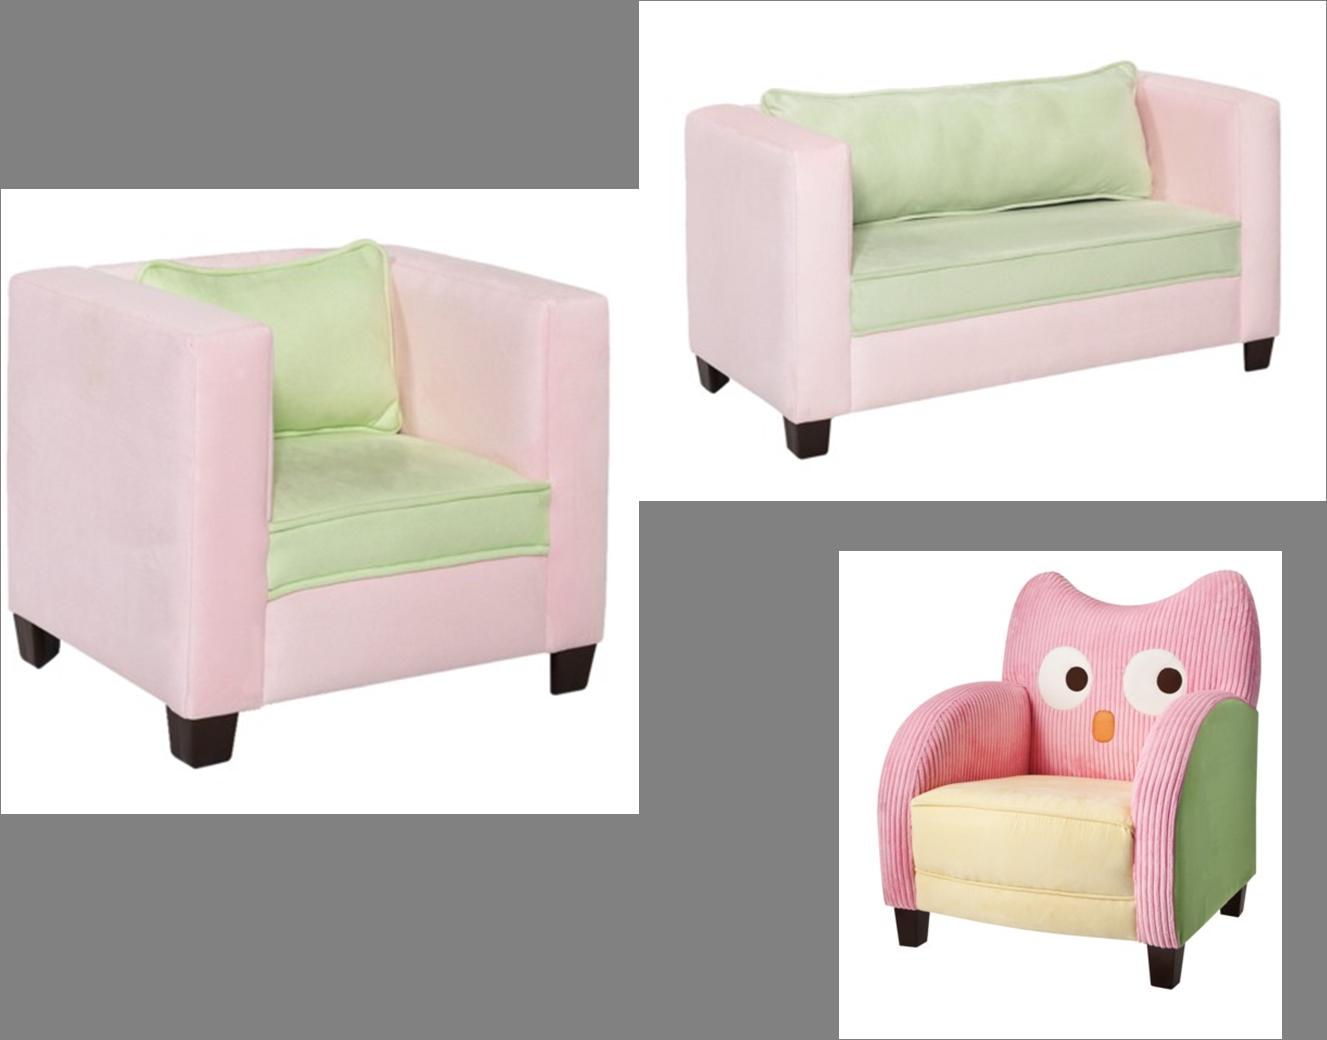 Delightful Playhouse Furniture At Target.